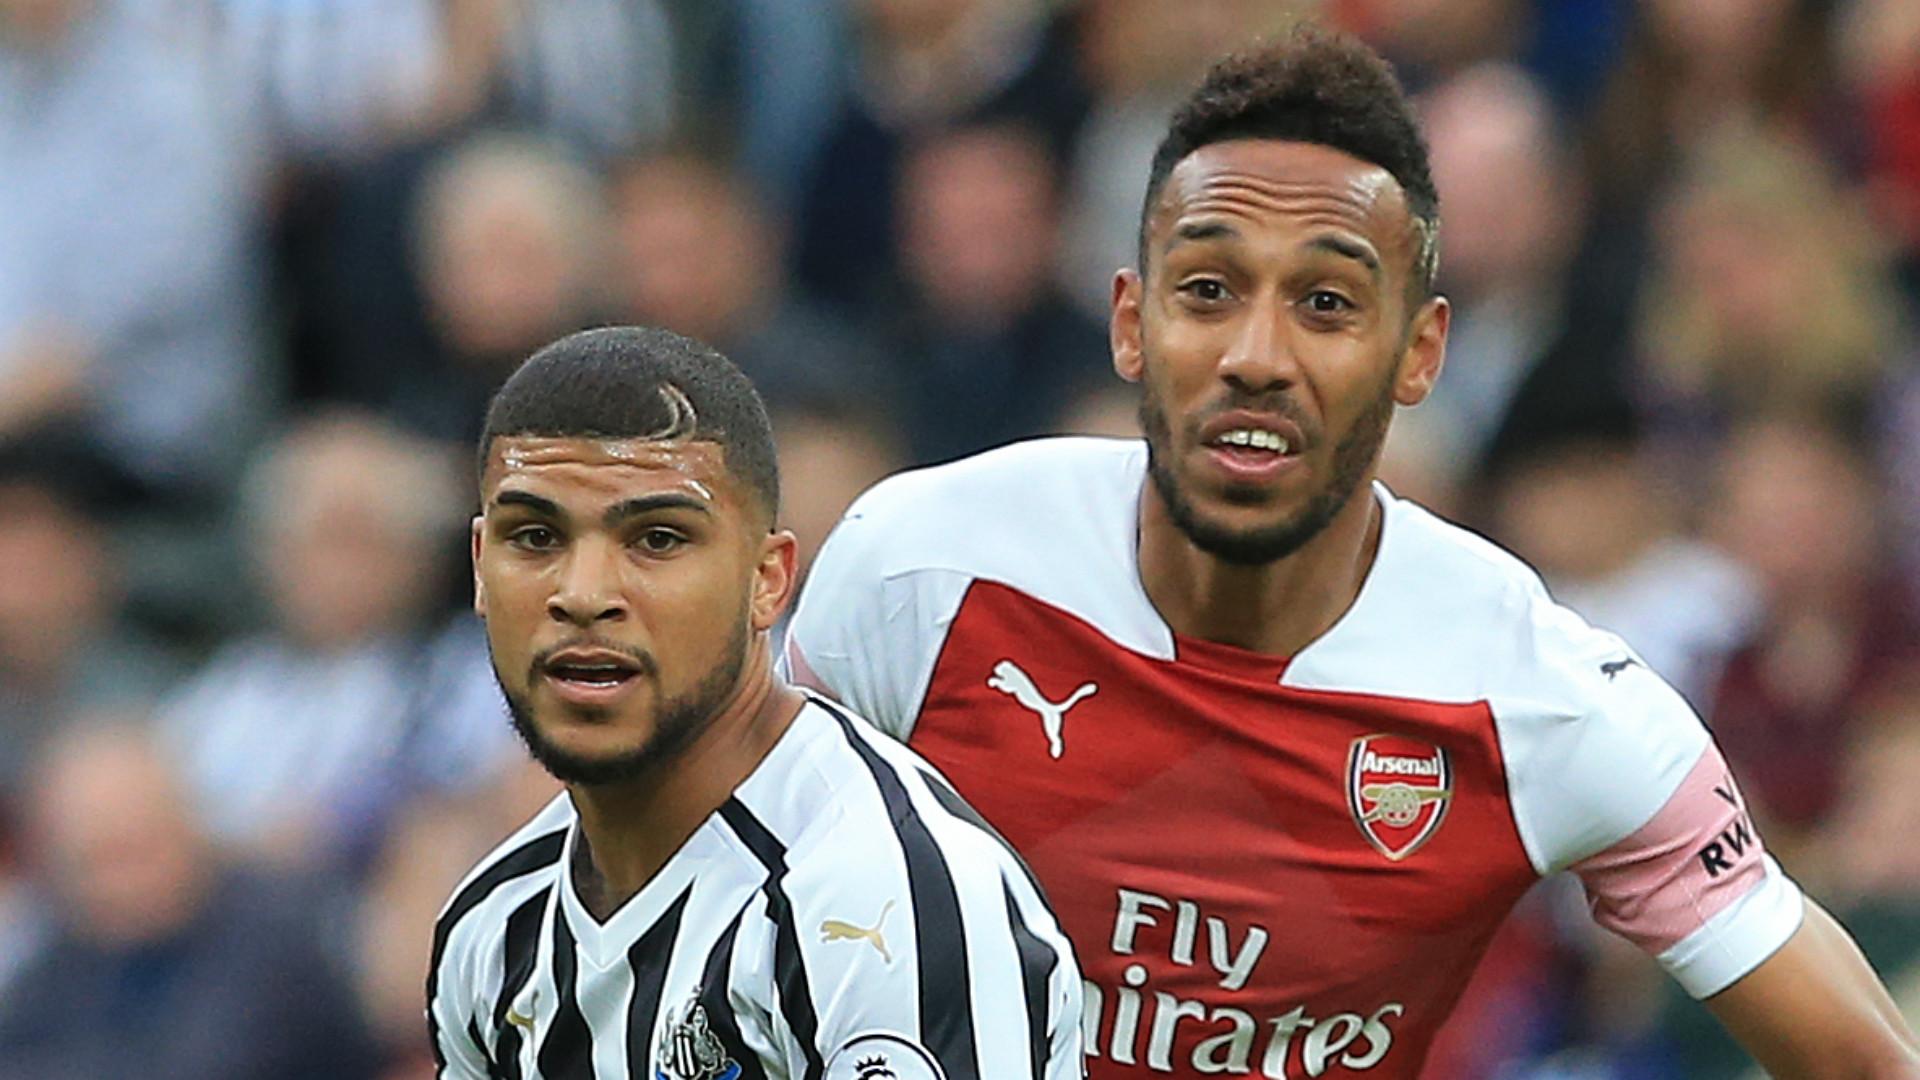 DeAndre Yedlin Pierre-Emerick Aubameyang Newcastle Arsenal 2018-19